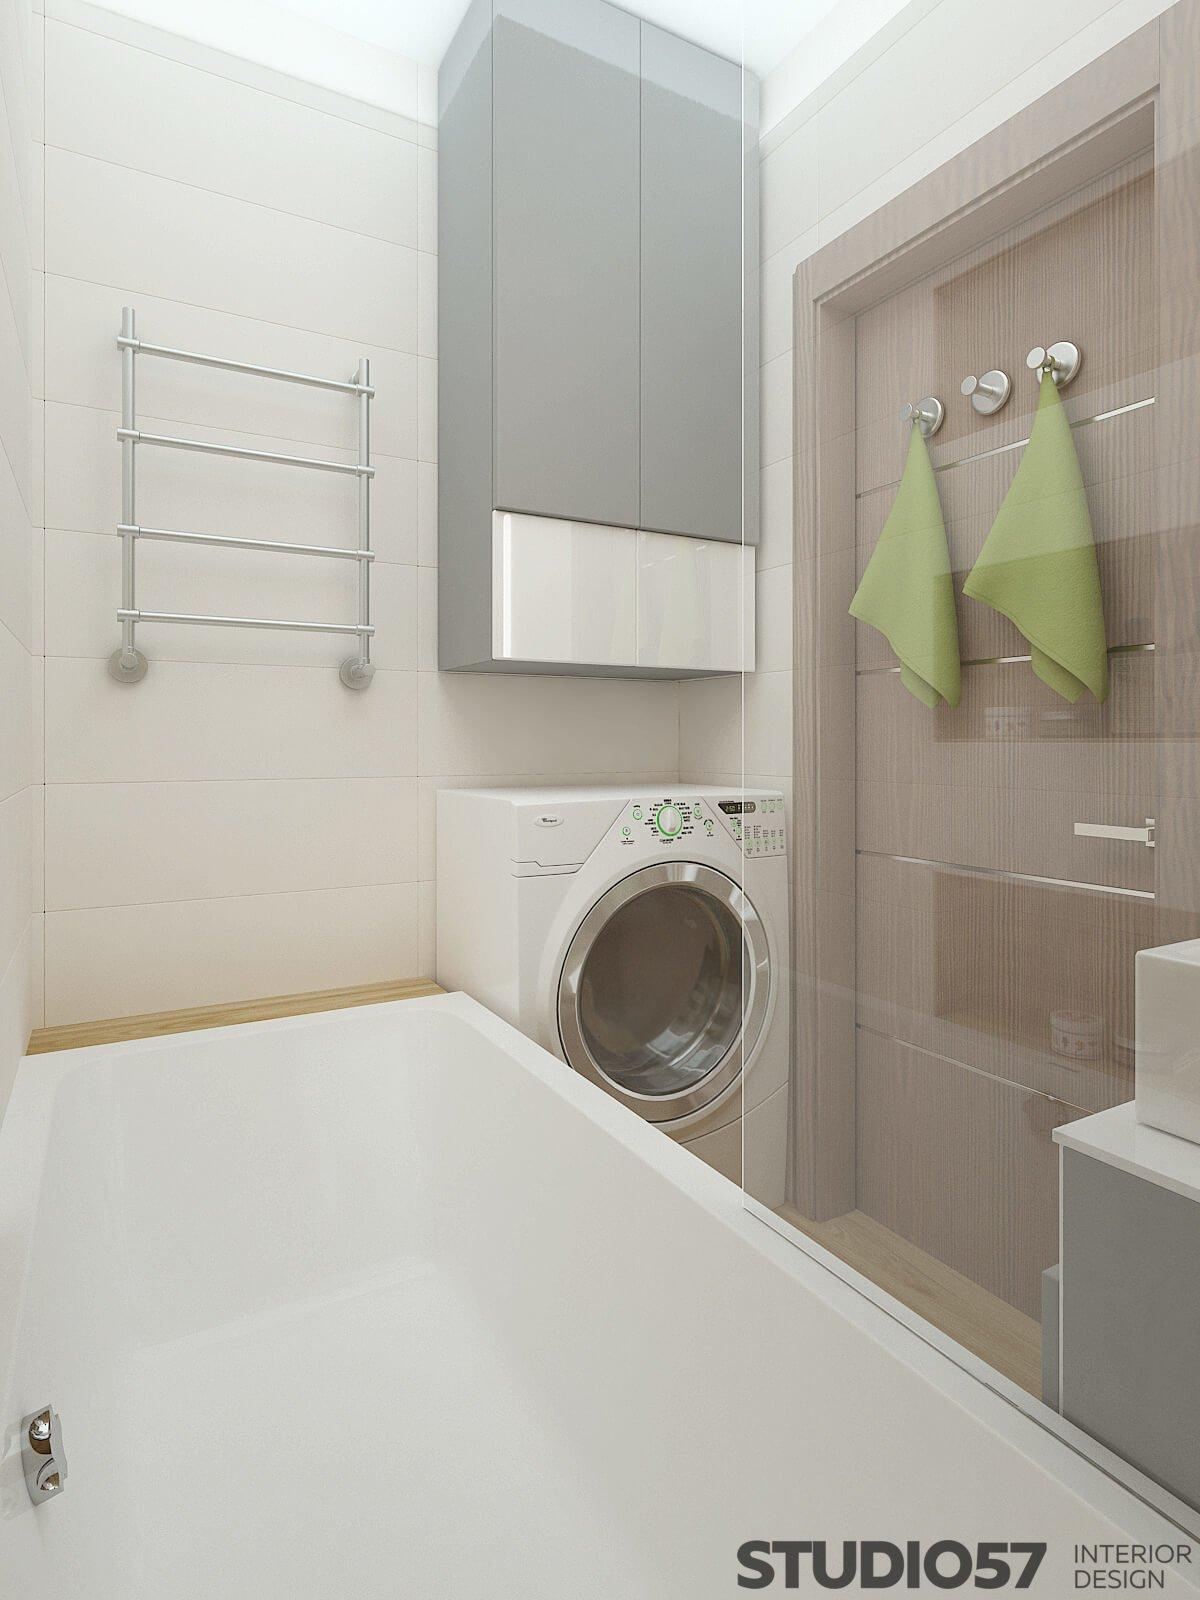 Визуализация светлой ванной комнаты